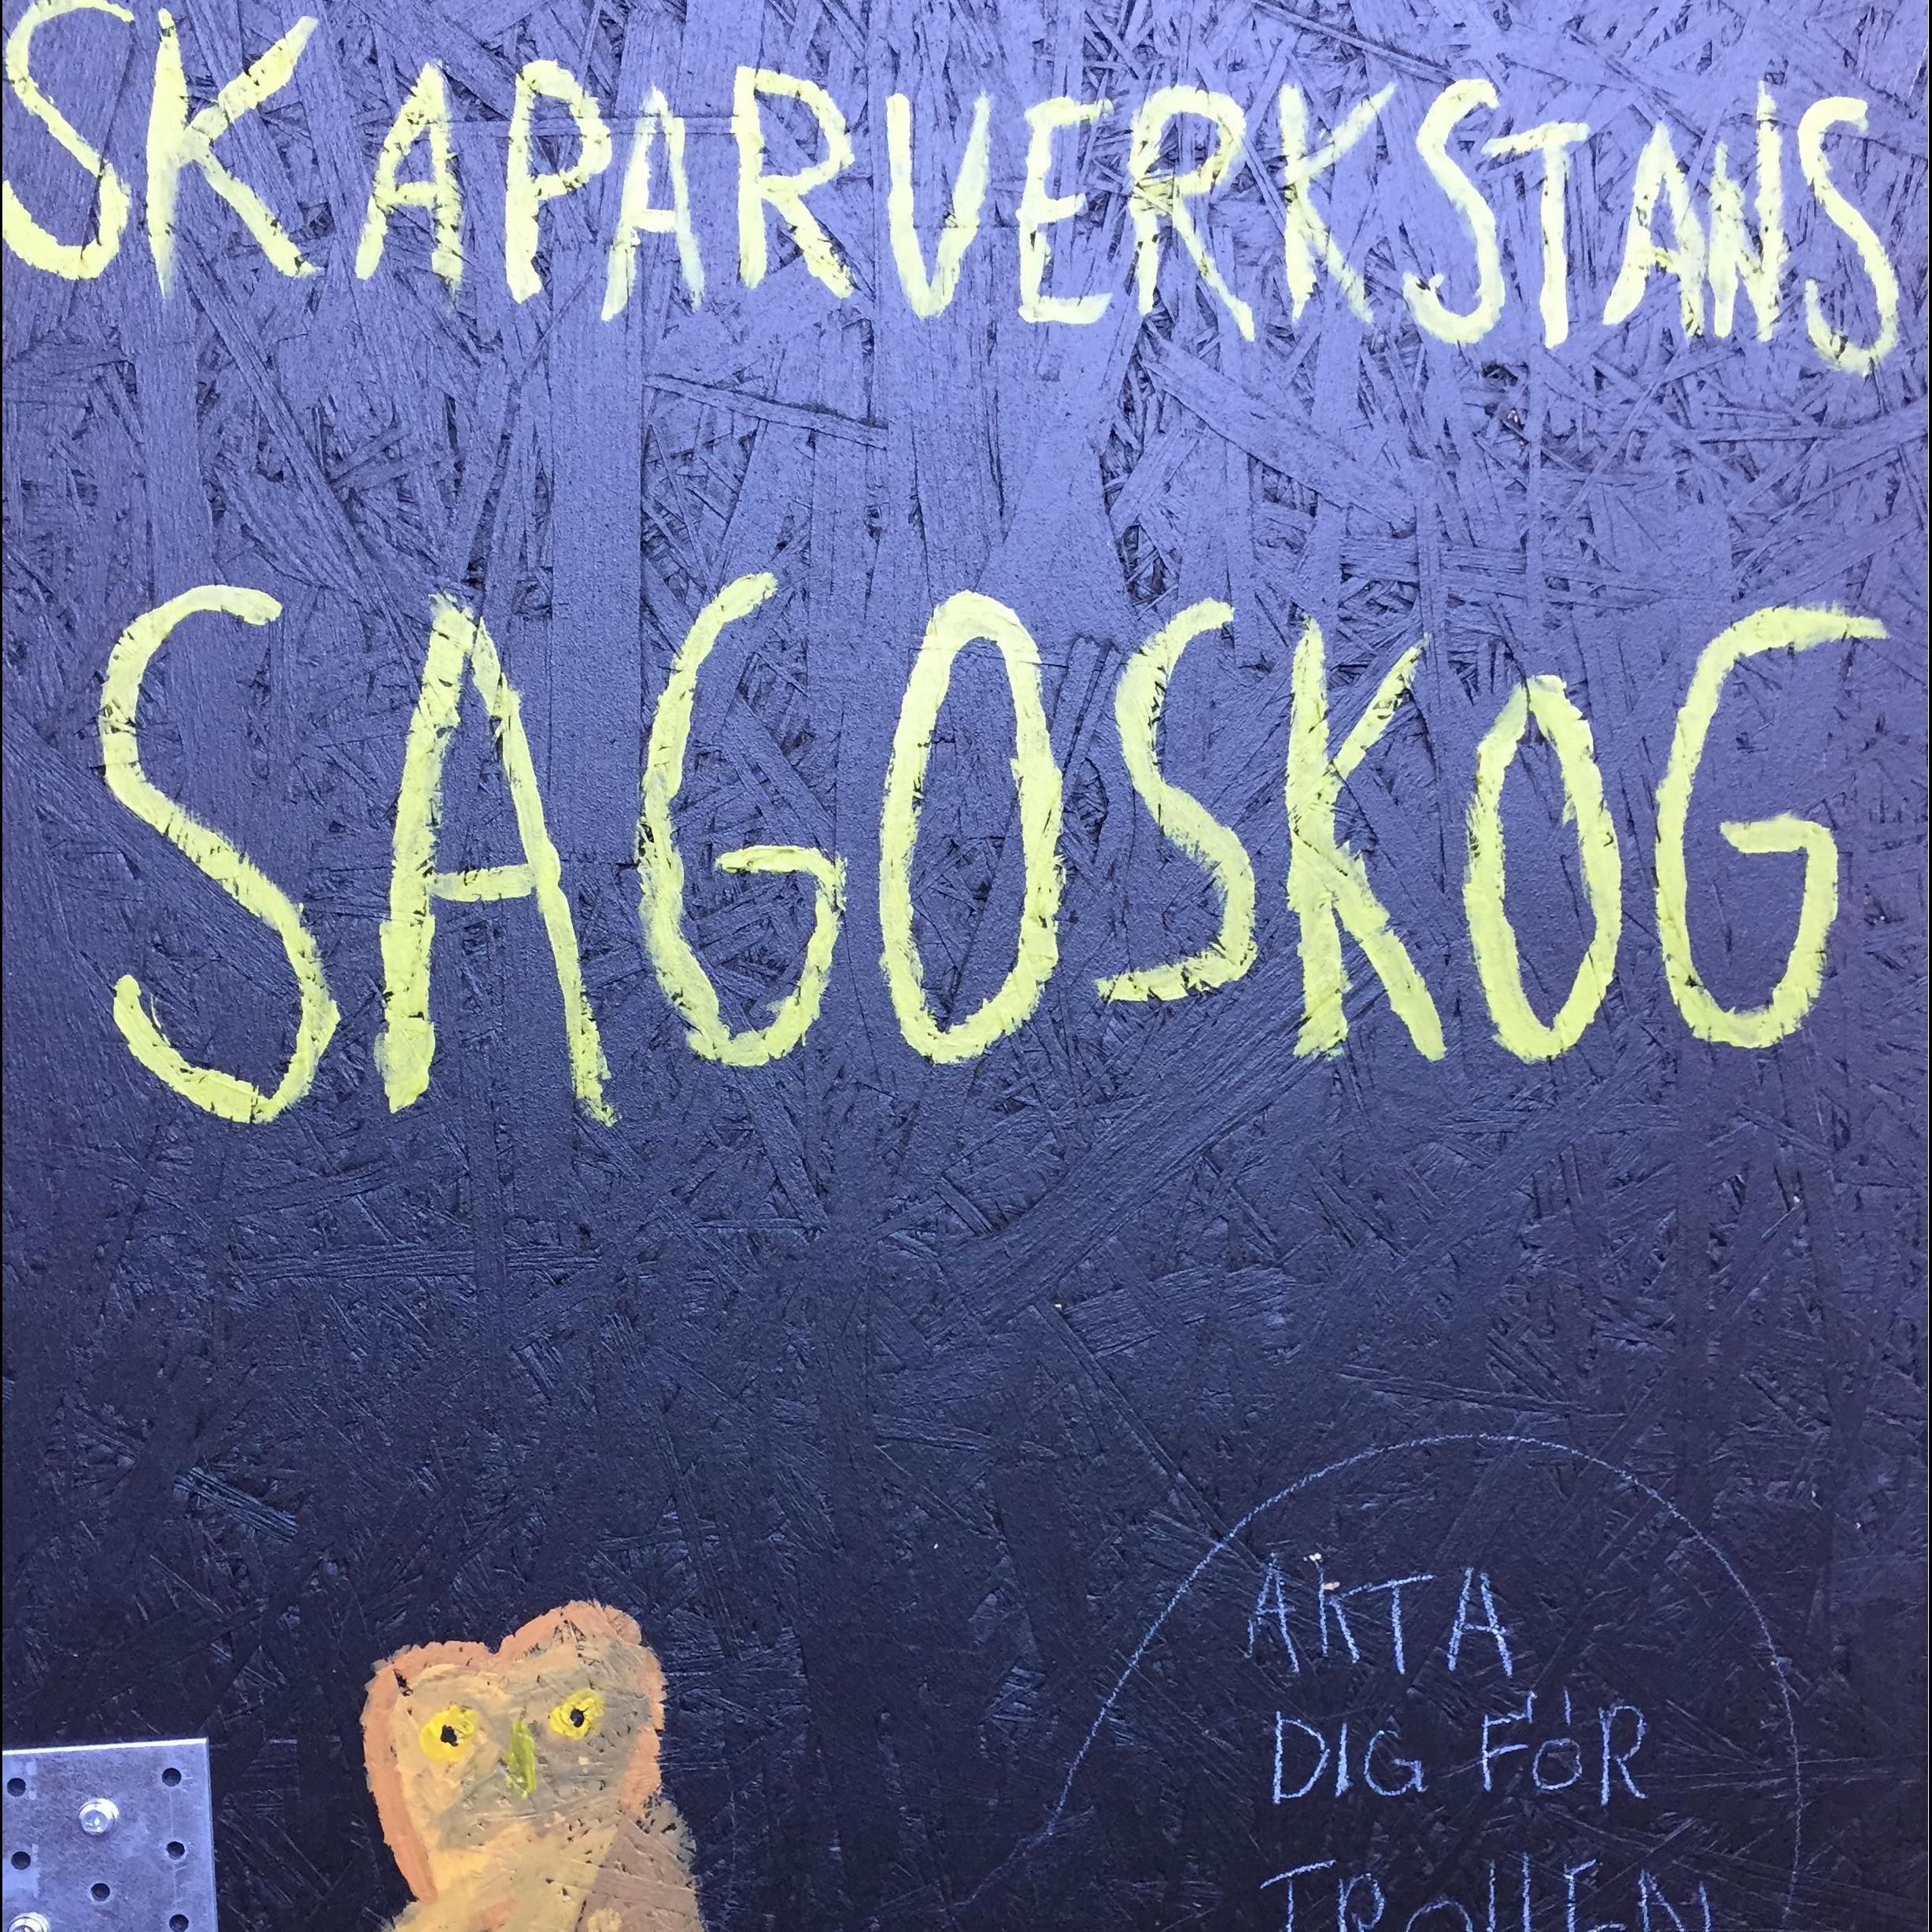 Skaparverkstans Sagoskog